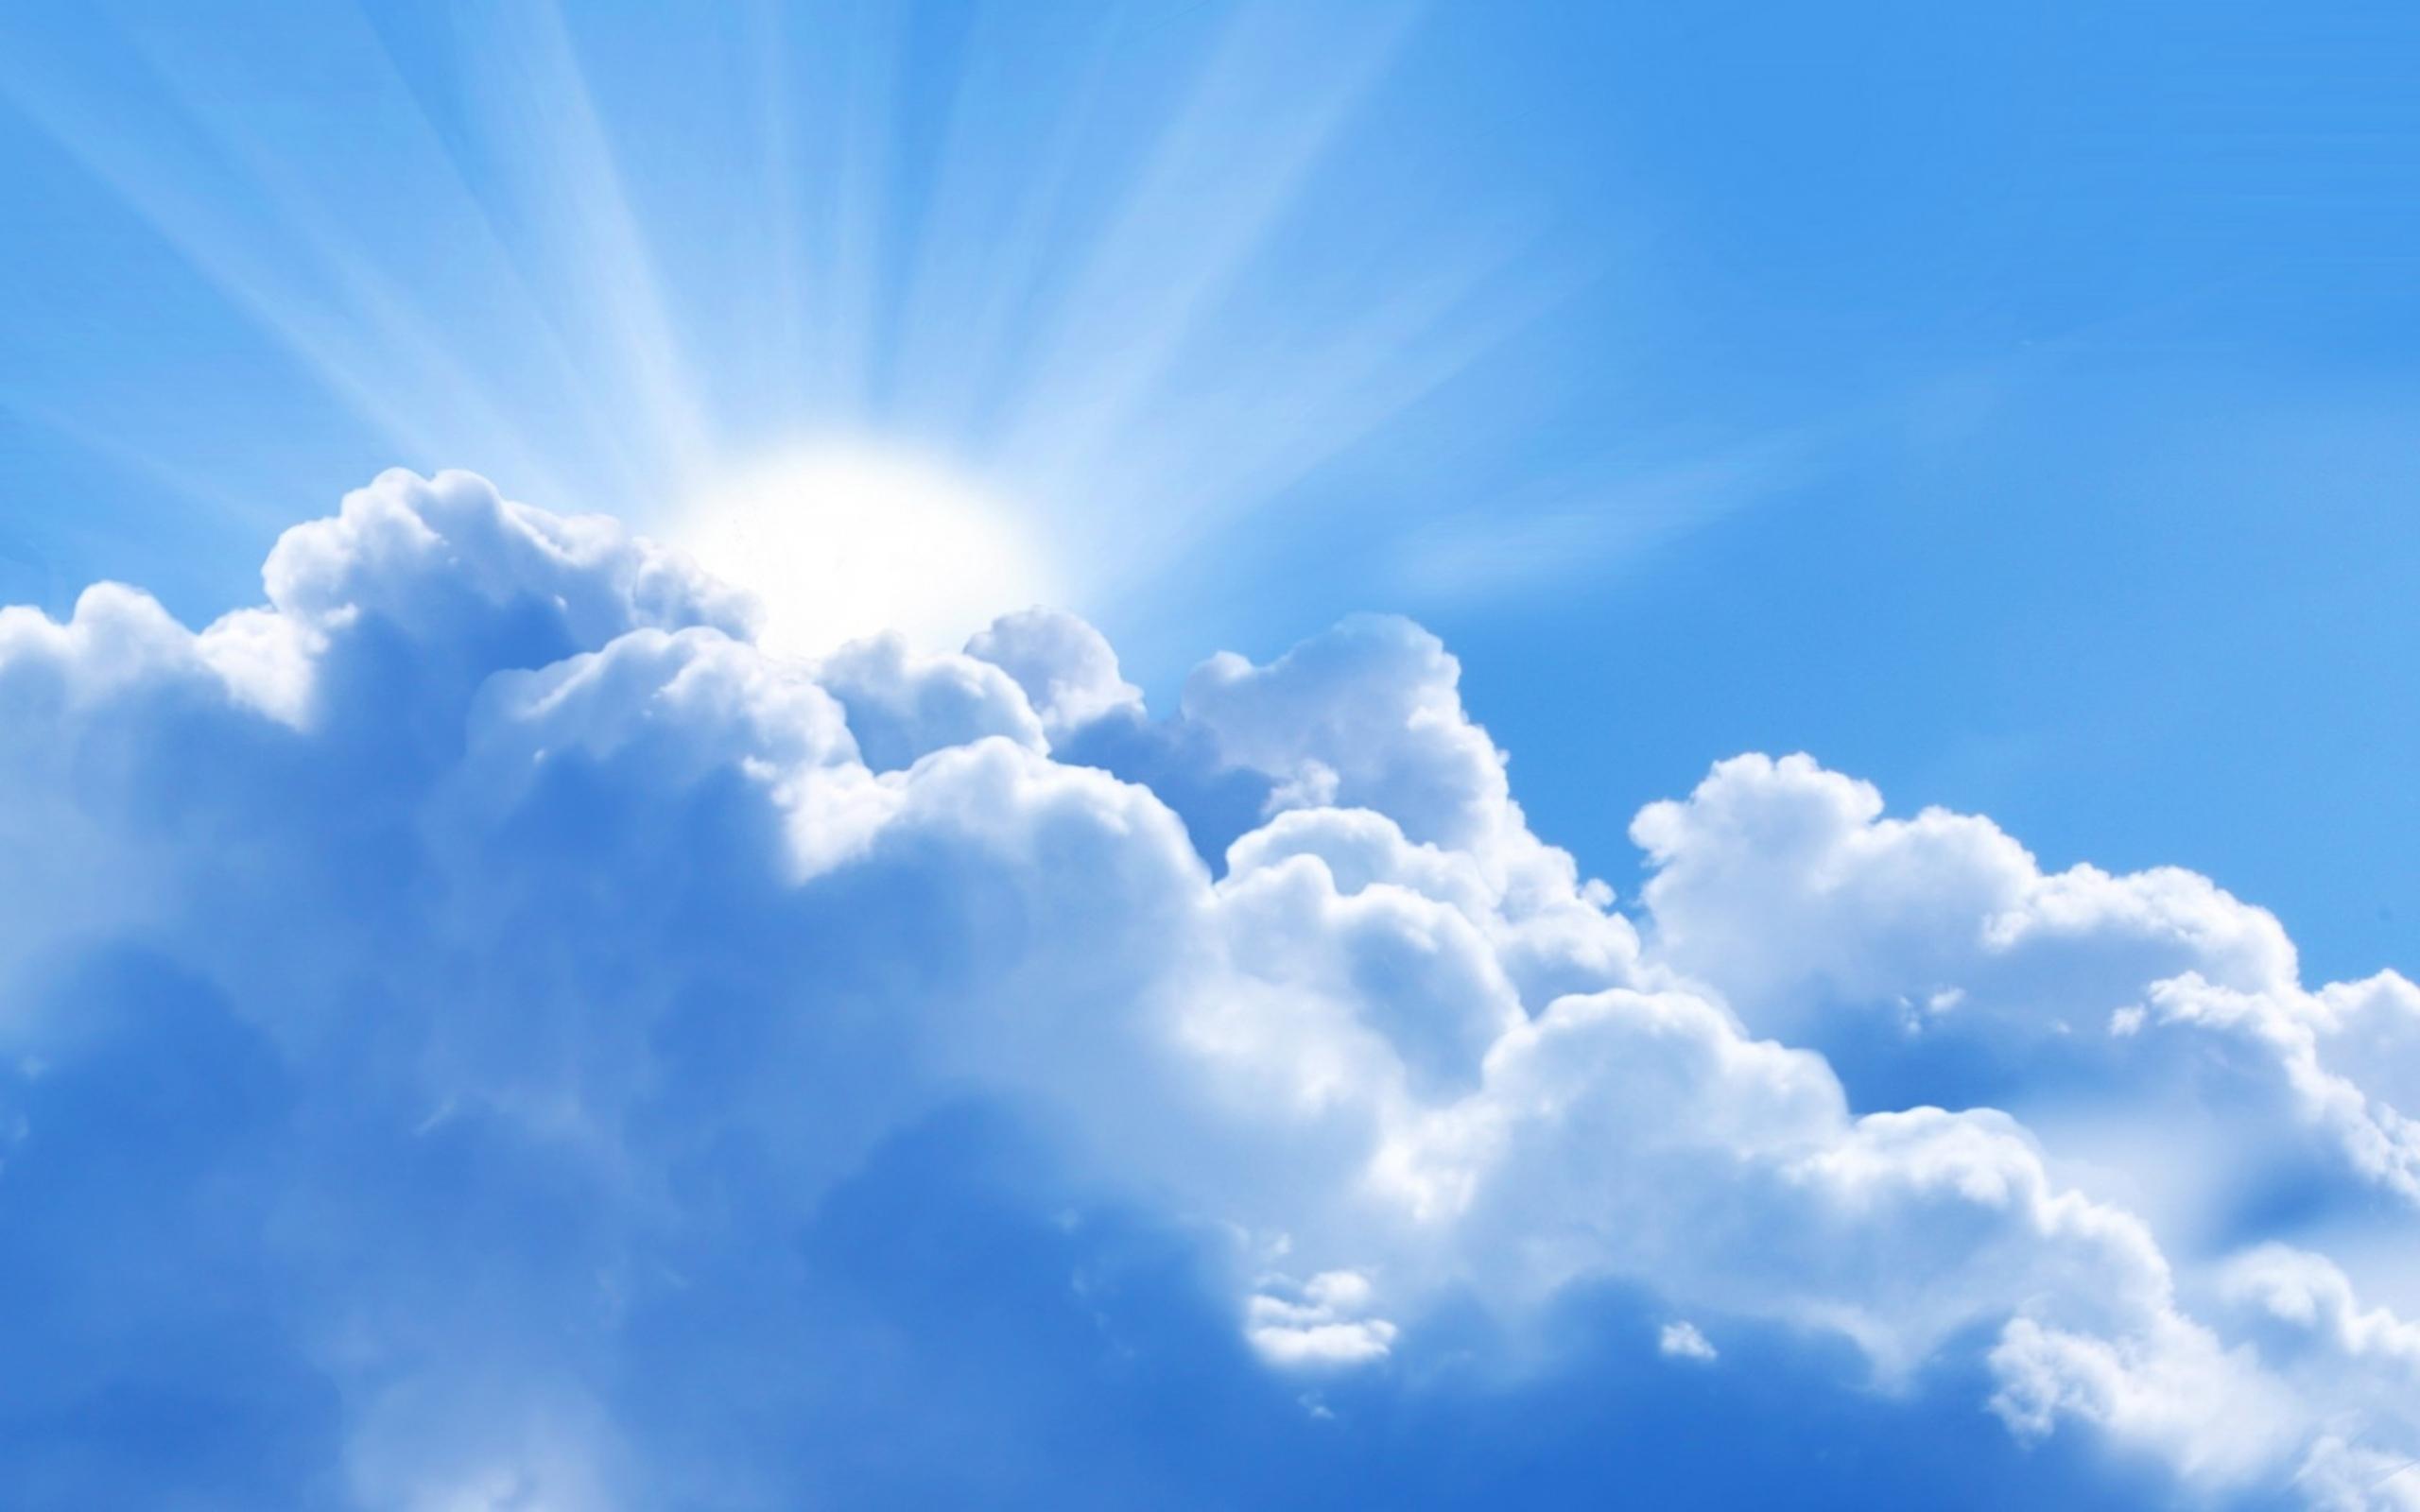 44+ Clouds and Blue Skies Wallpaper on WallpaperSafari